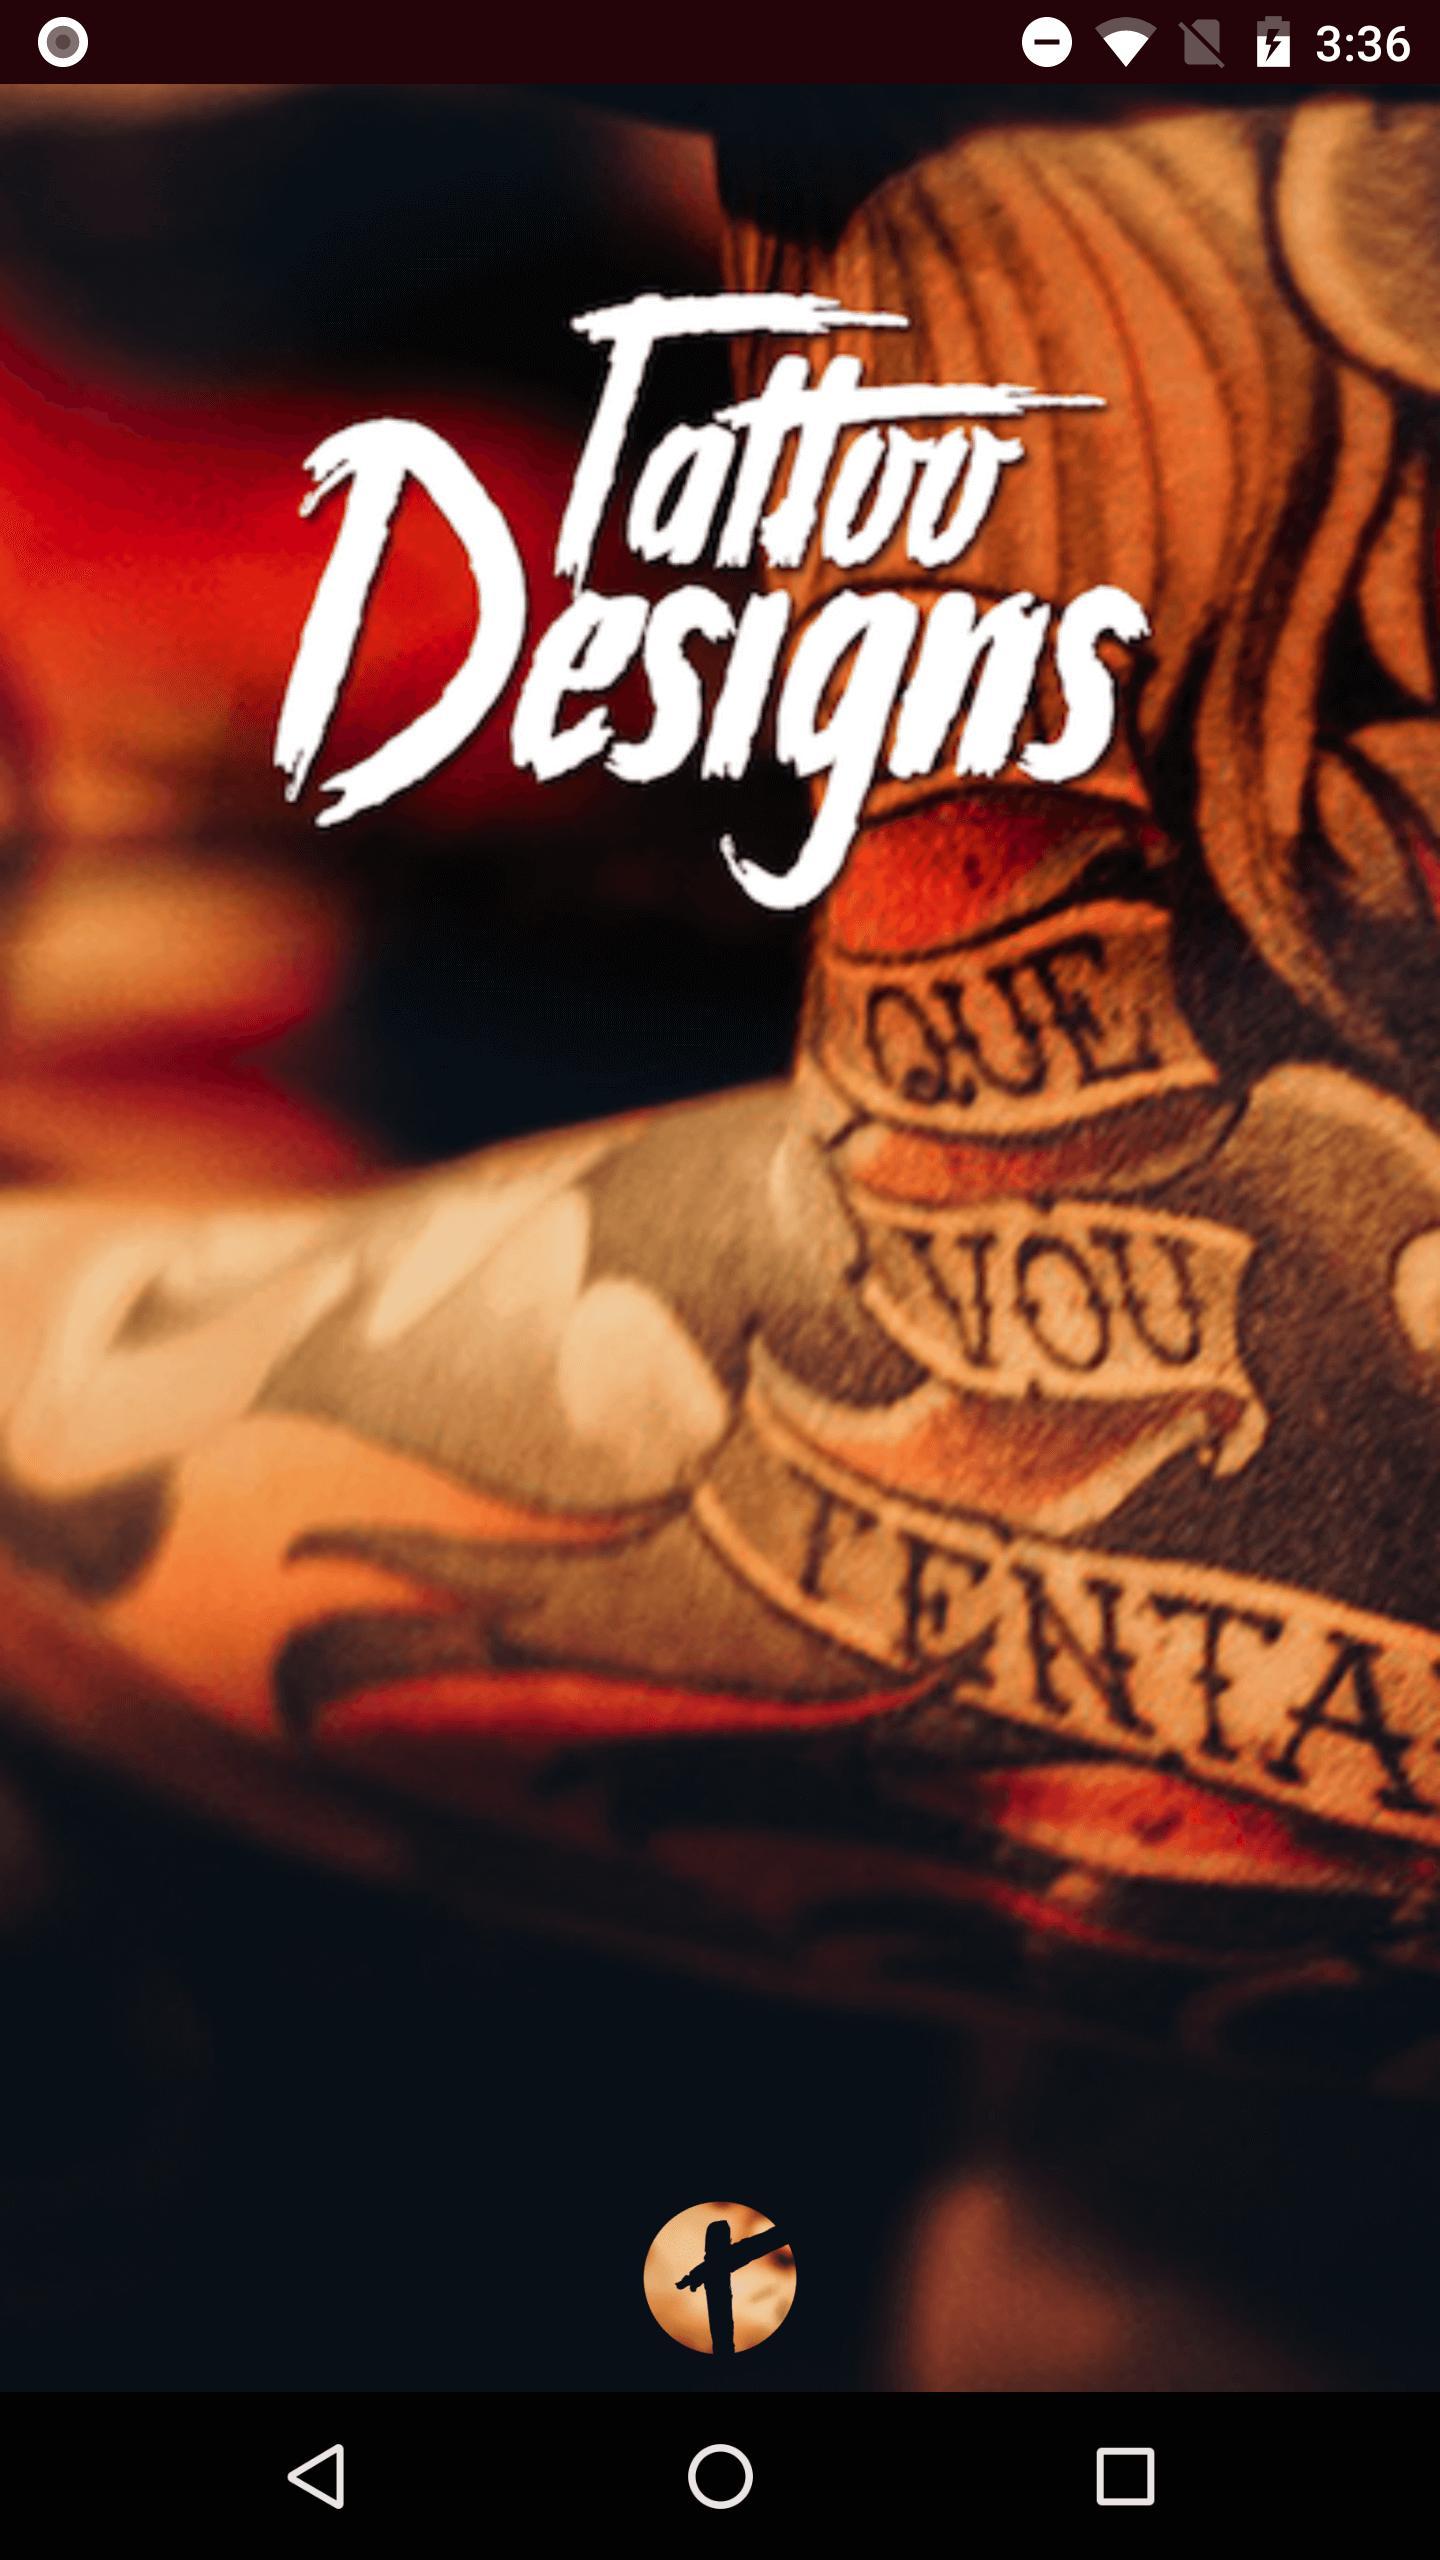 Tattoo Design Ideas poster